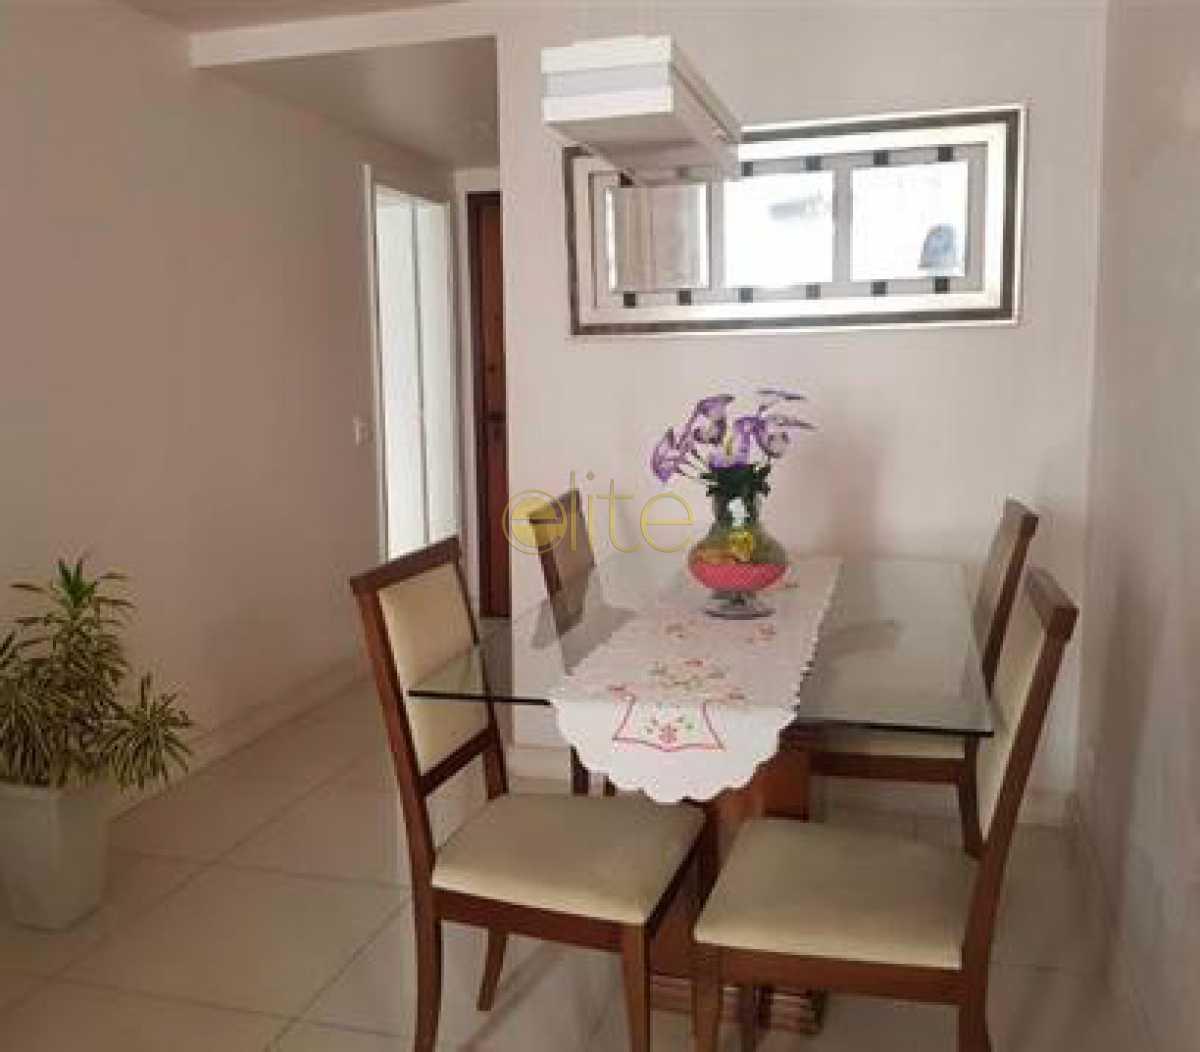 2. - Apartamento Condomínio Summer Coast, Barra da Tijuca, Barra da Tijuca,Rio de Janeiro, RJ À Venda, 65m² - EBAP00015 - 3